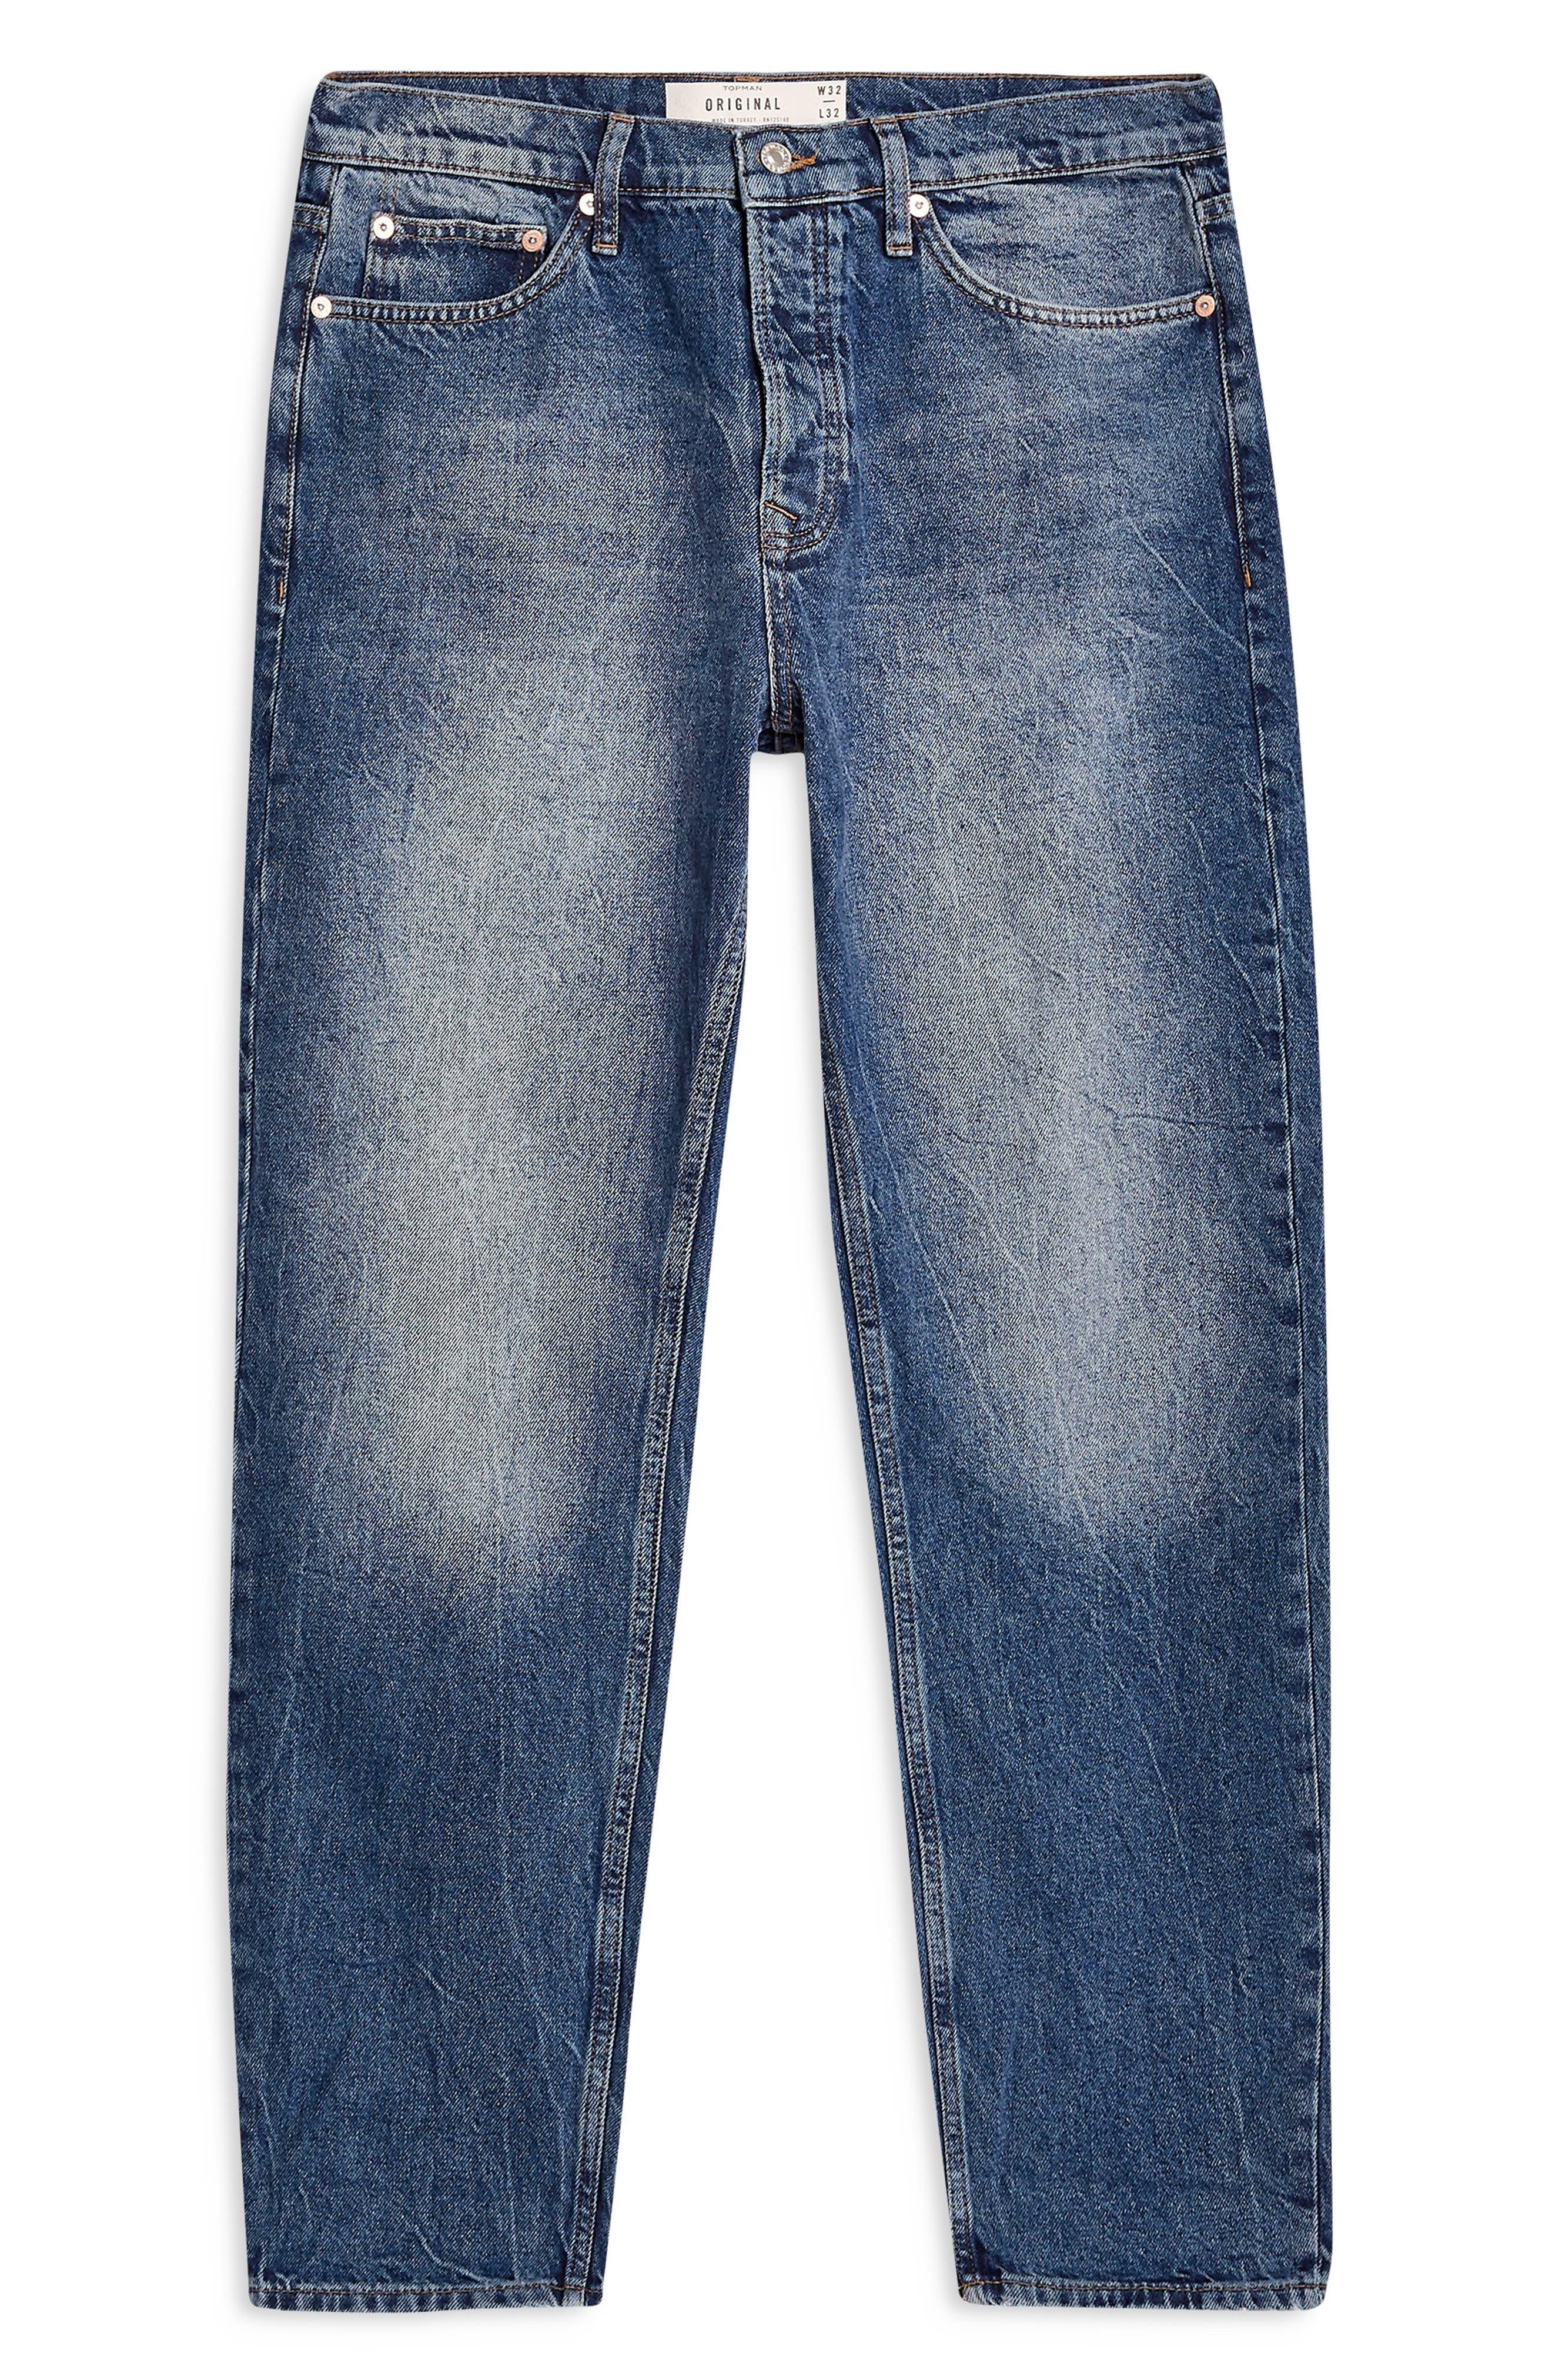 TOPMAN, Billy Original Fit Jeans, Alternate thumbnail 3, color, BLUE